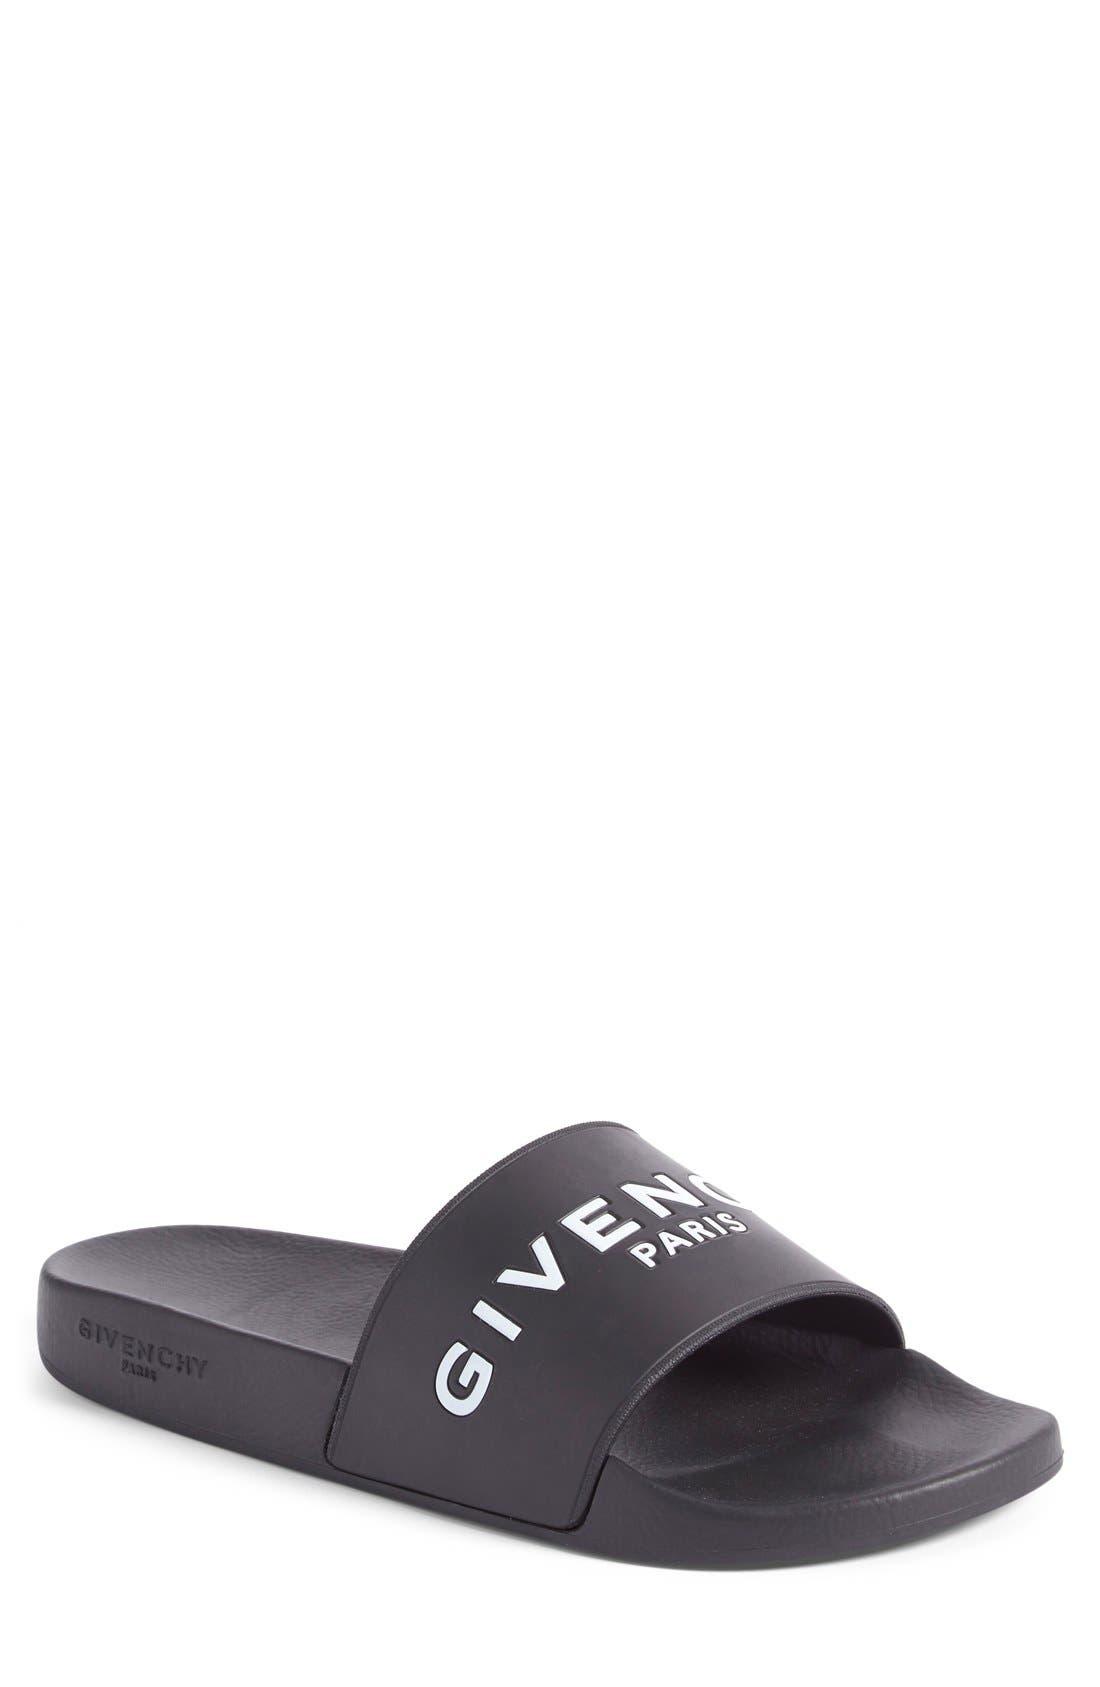 Slide Sandal,                             Main thumbnail 1, color,                             Black Leather